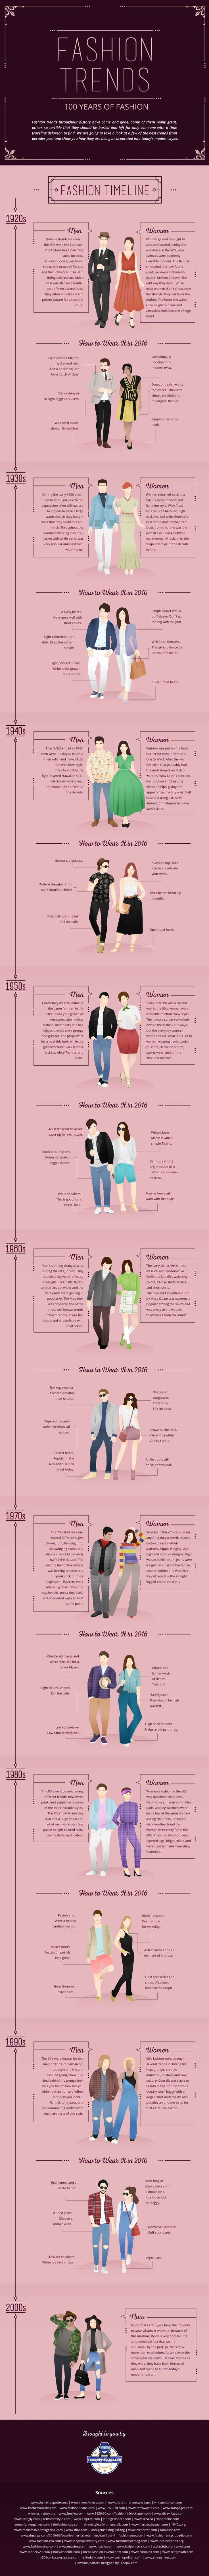 100 años moda adaptarla estilo moderno infografía #LolitaModa